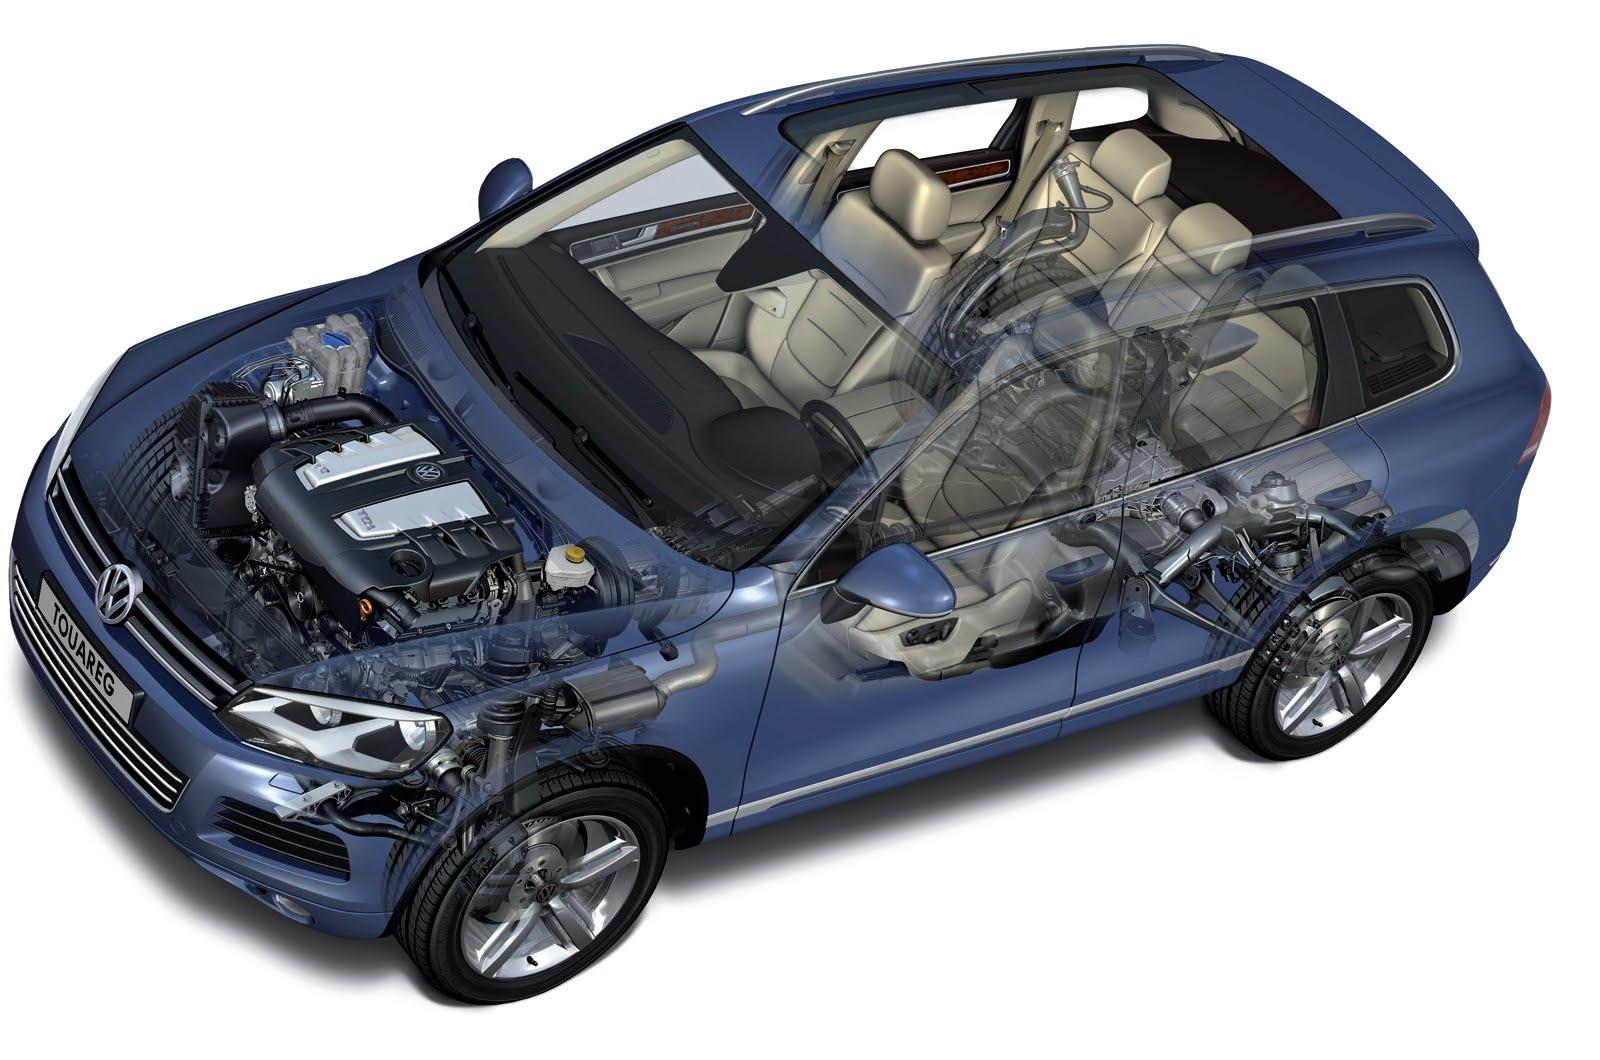 Volkswagen seven seat SUV